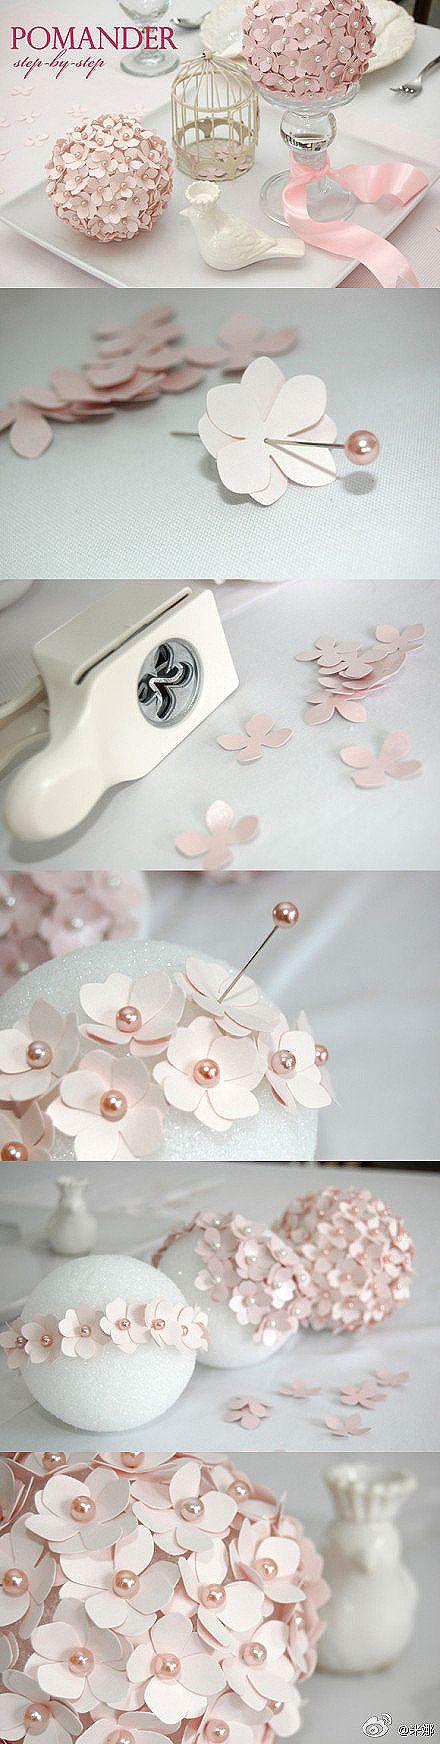 10 creative diy wedding centerpieces with tutorials flower ball 10 creative diy wedding centerpieces with tutorials paper flower ballpaper mightylinksfo